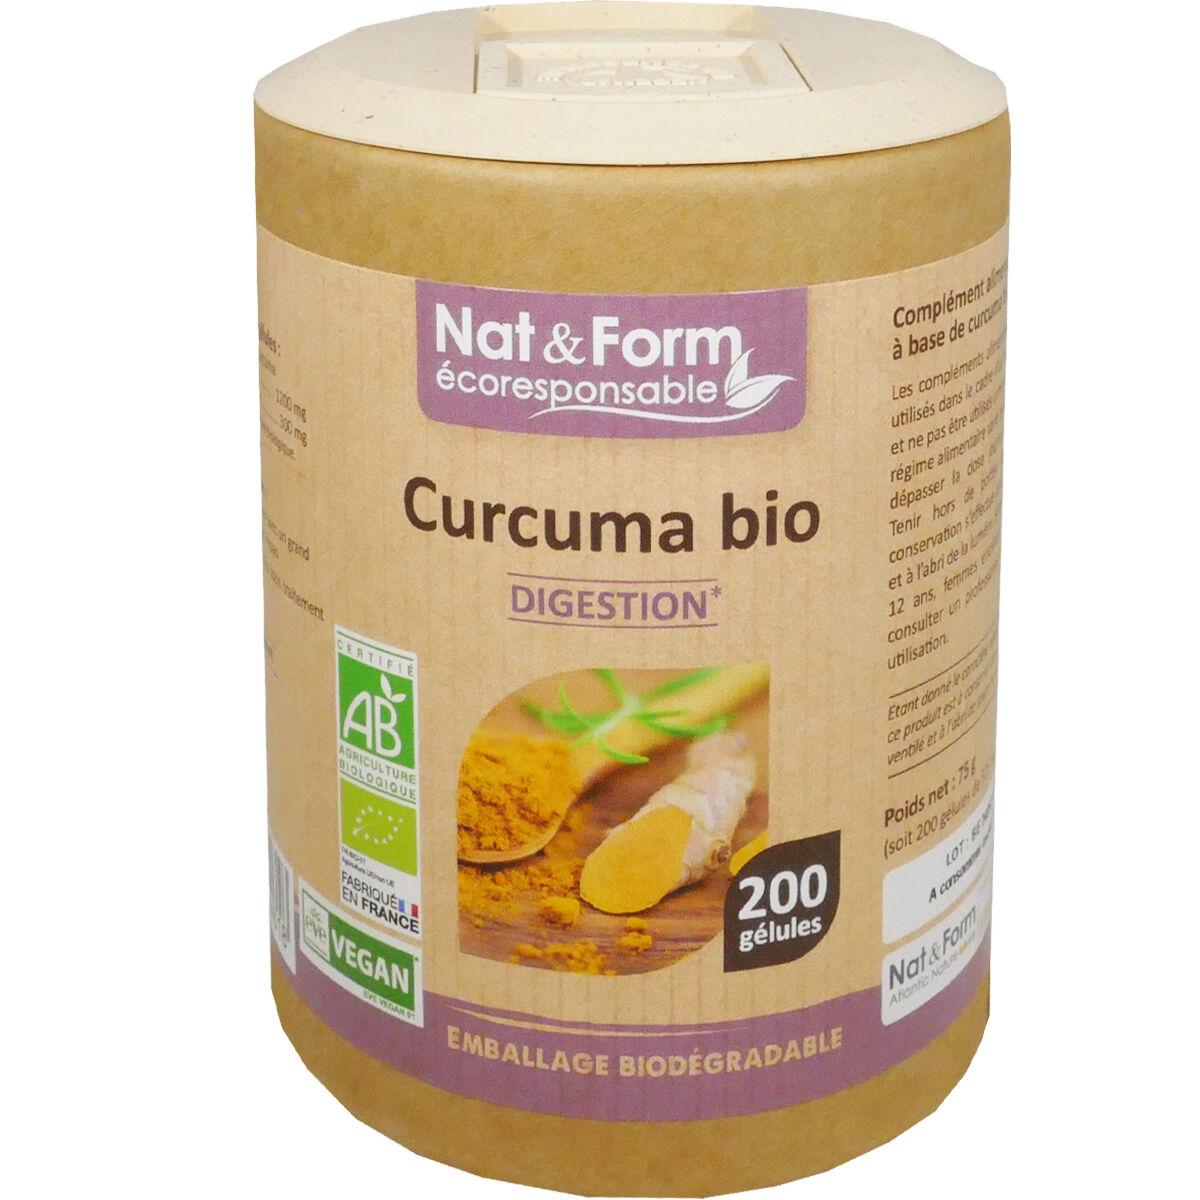 Nat & form curcuma bio 200 gelules